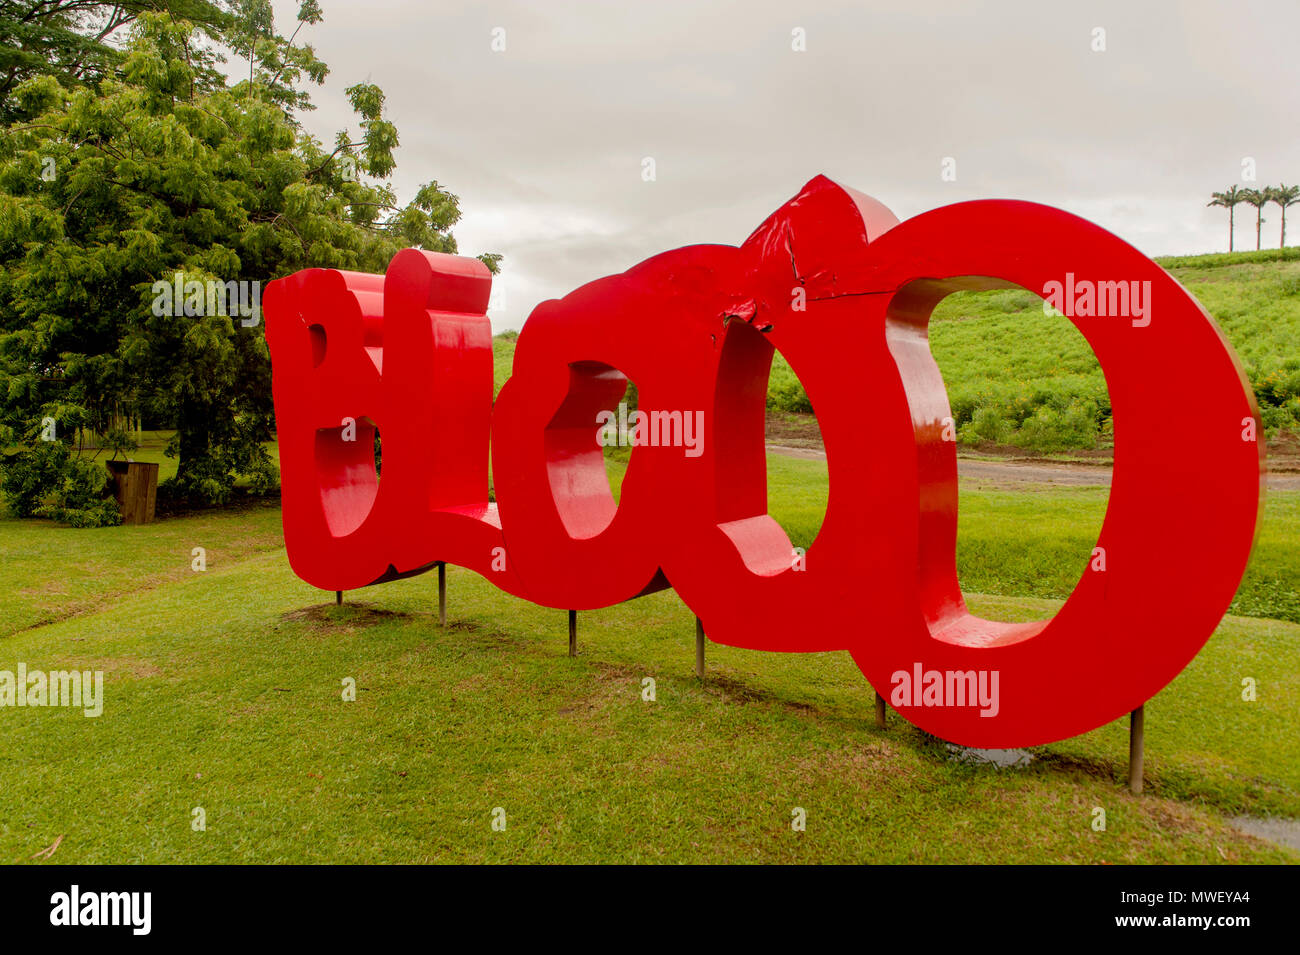 """Sangue"", una scultura da Thierry Alet a dimora Clément, Martinica Immagini Stock"